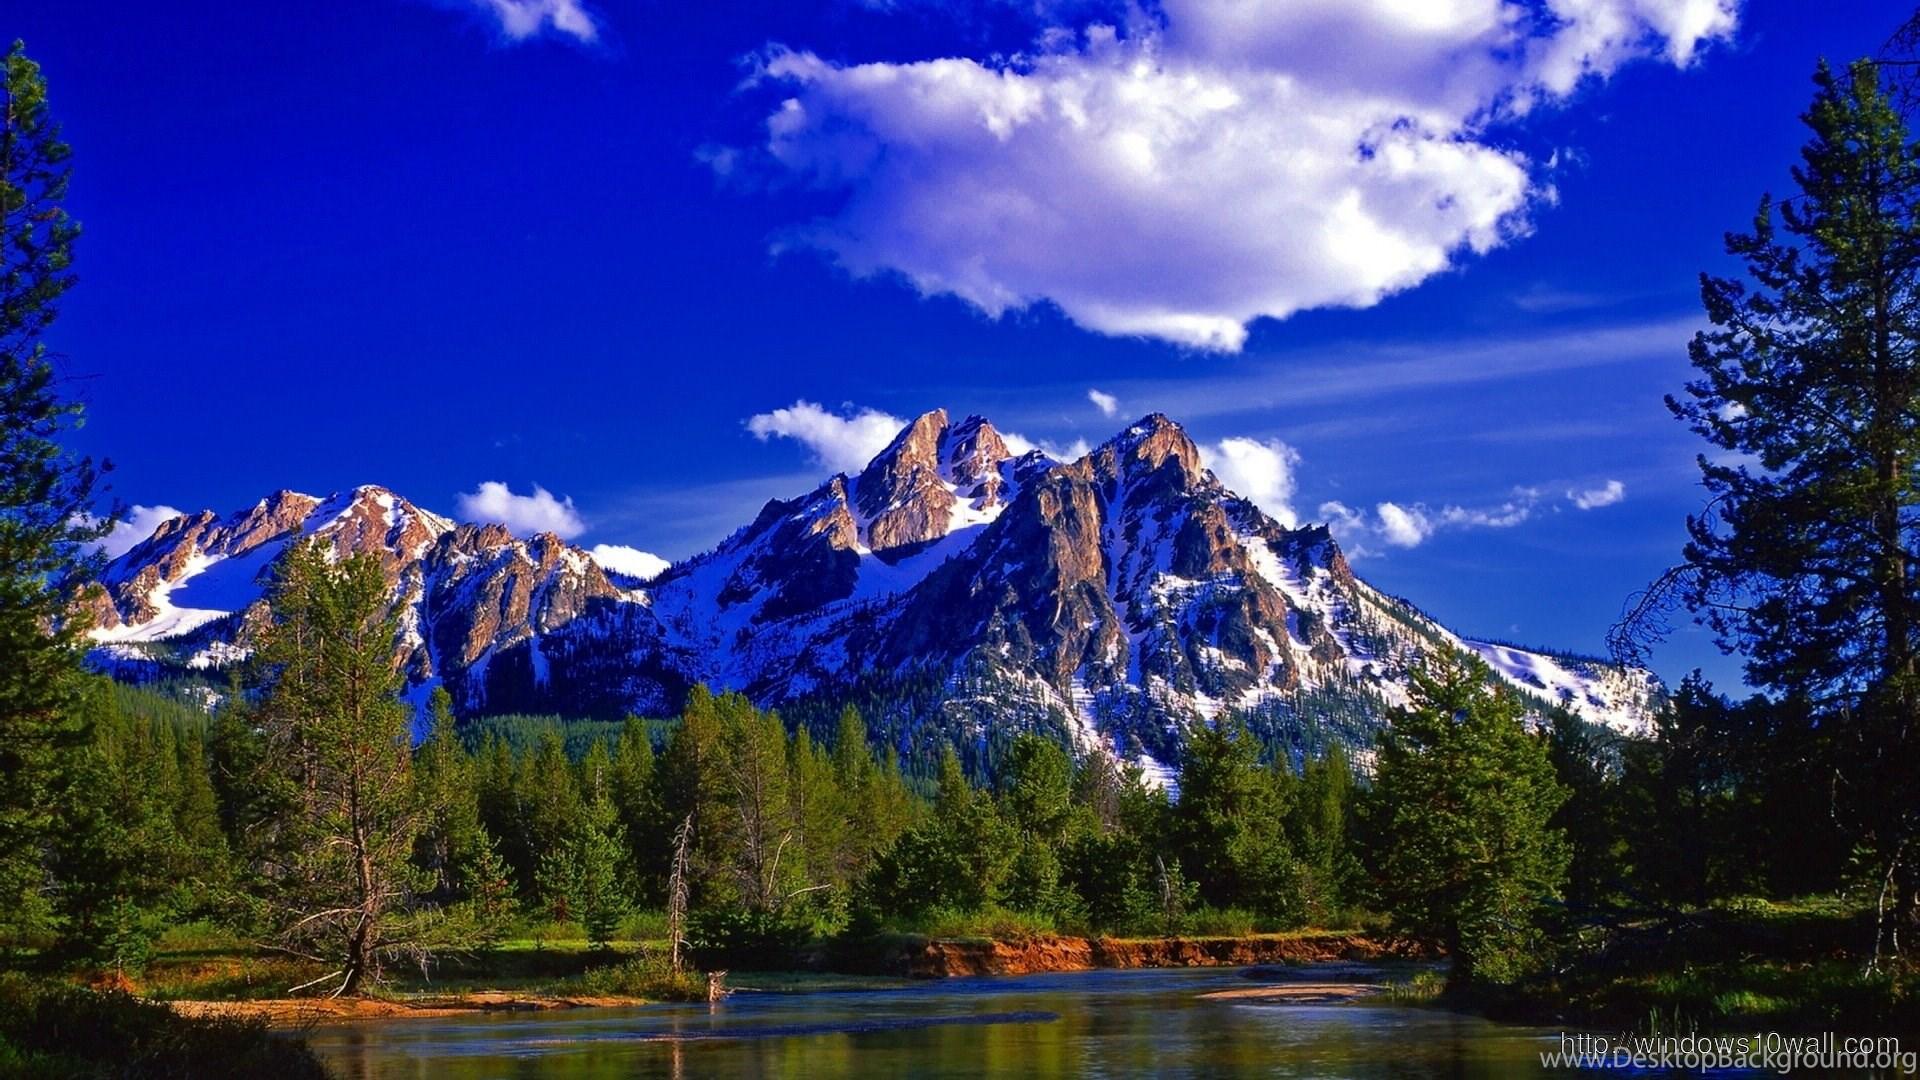 Mountain Nature Blue Sky Wallpapers Windows 10 Desktop